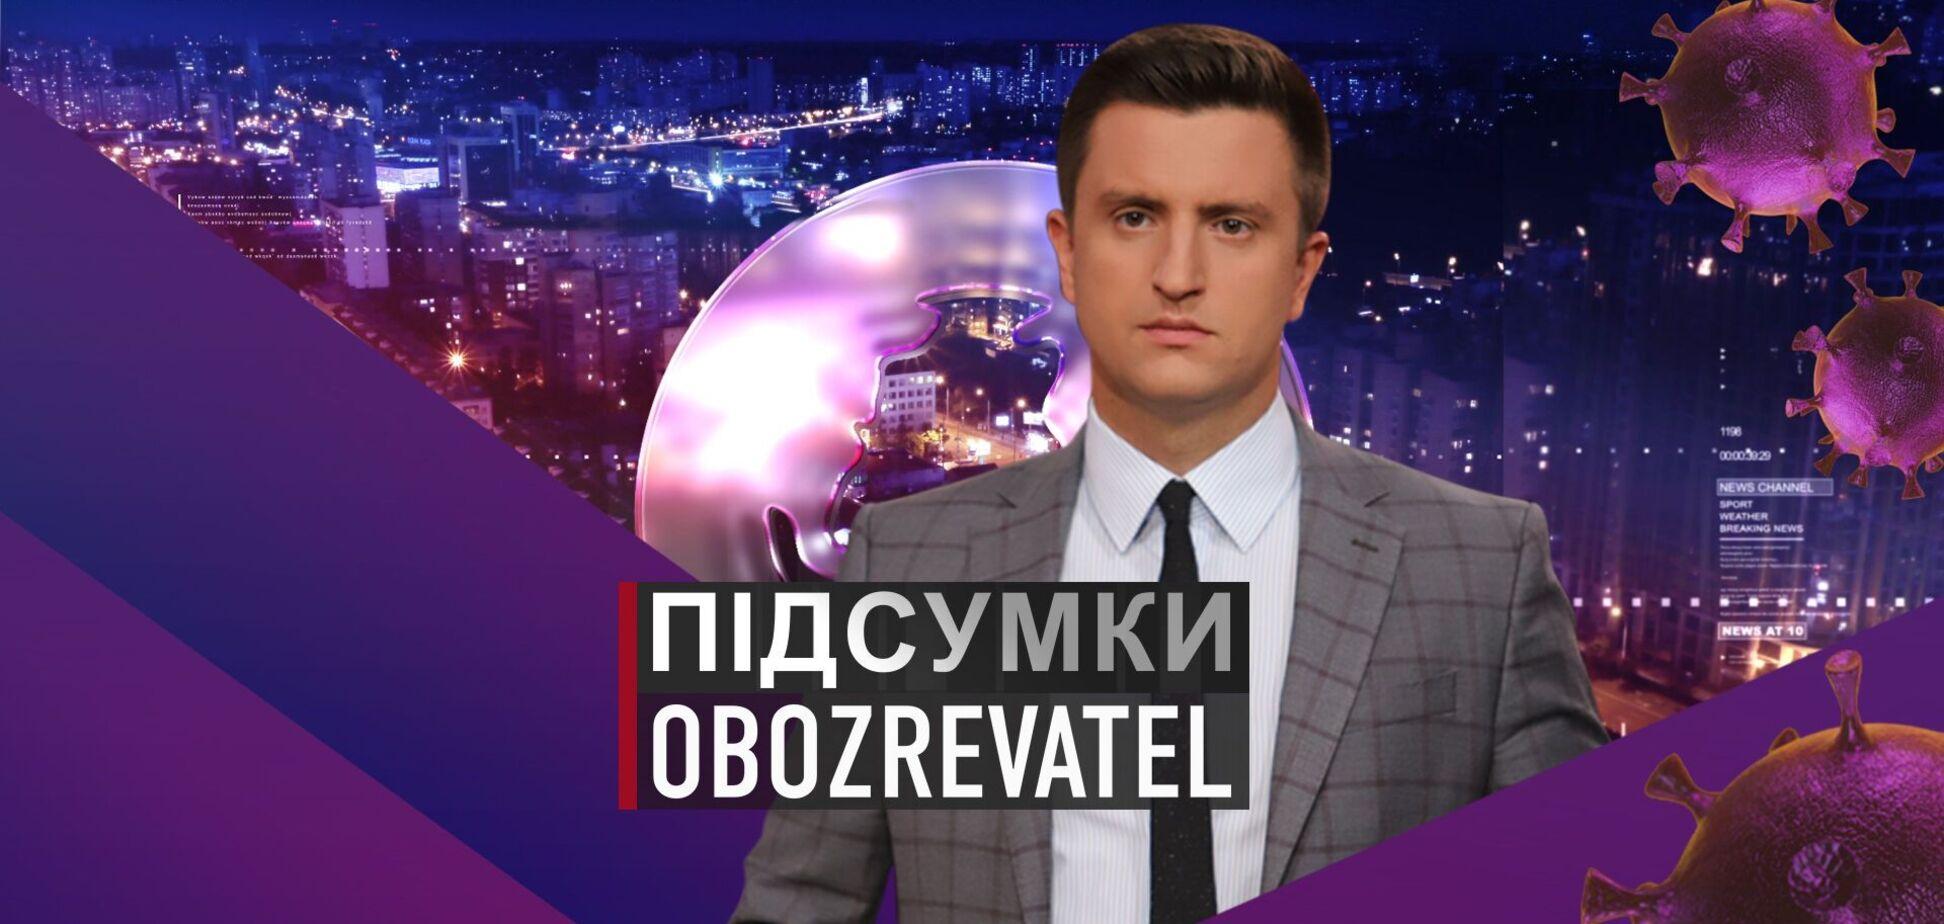 Підсумки с Вадимом Колодийчуком. Пятница, 2 июля